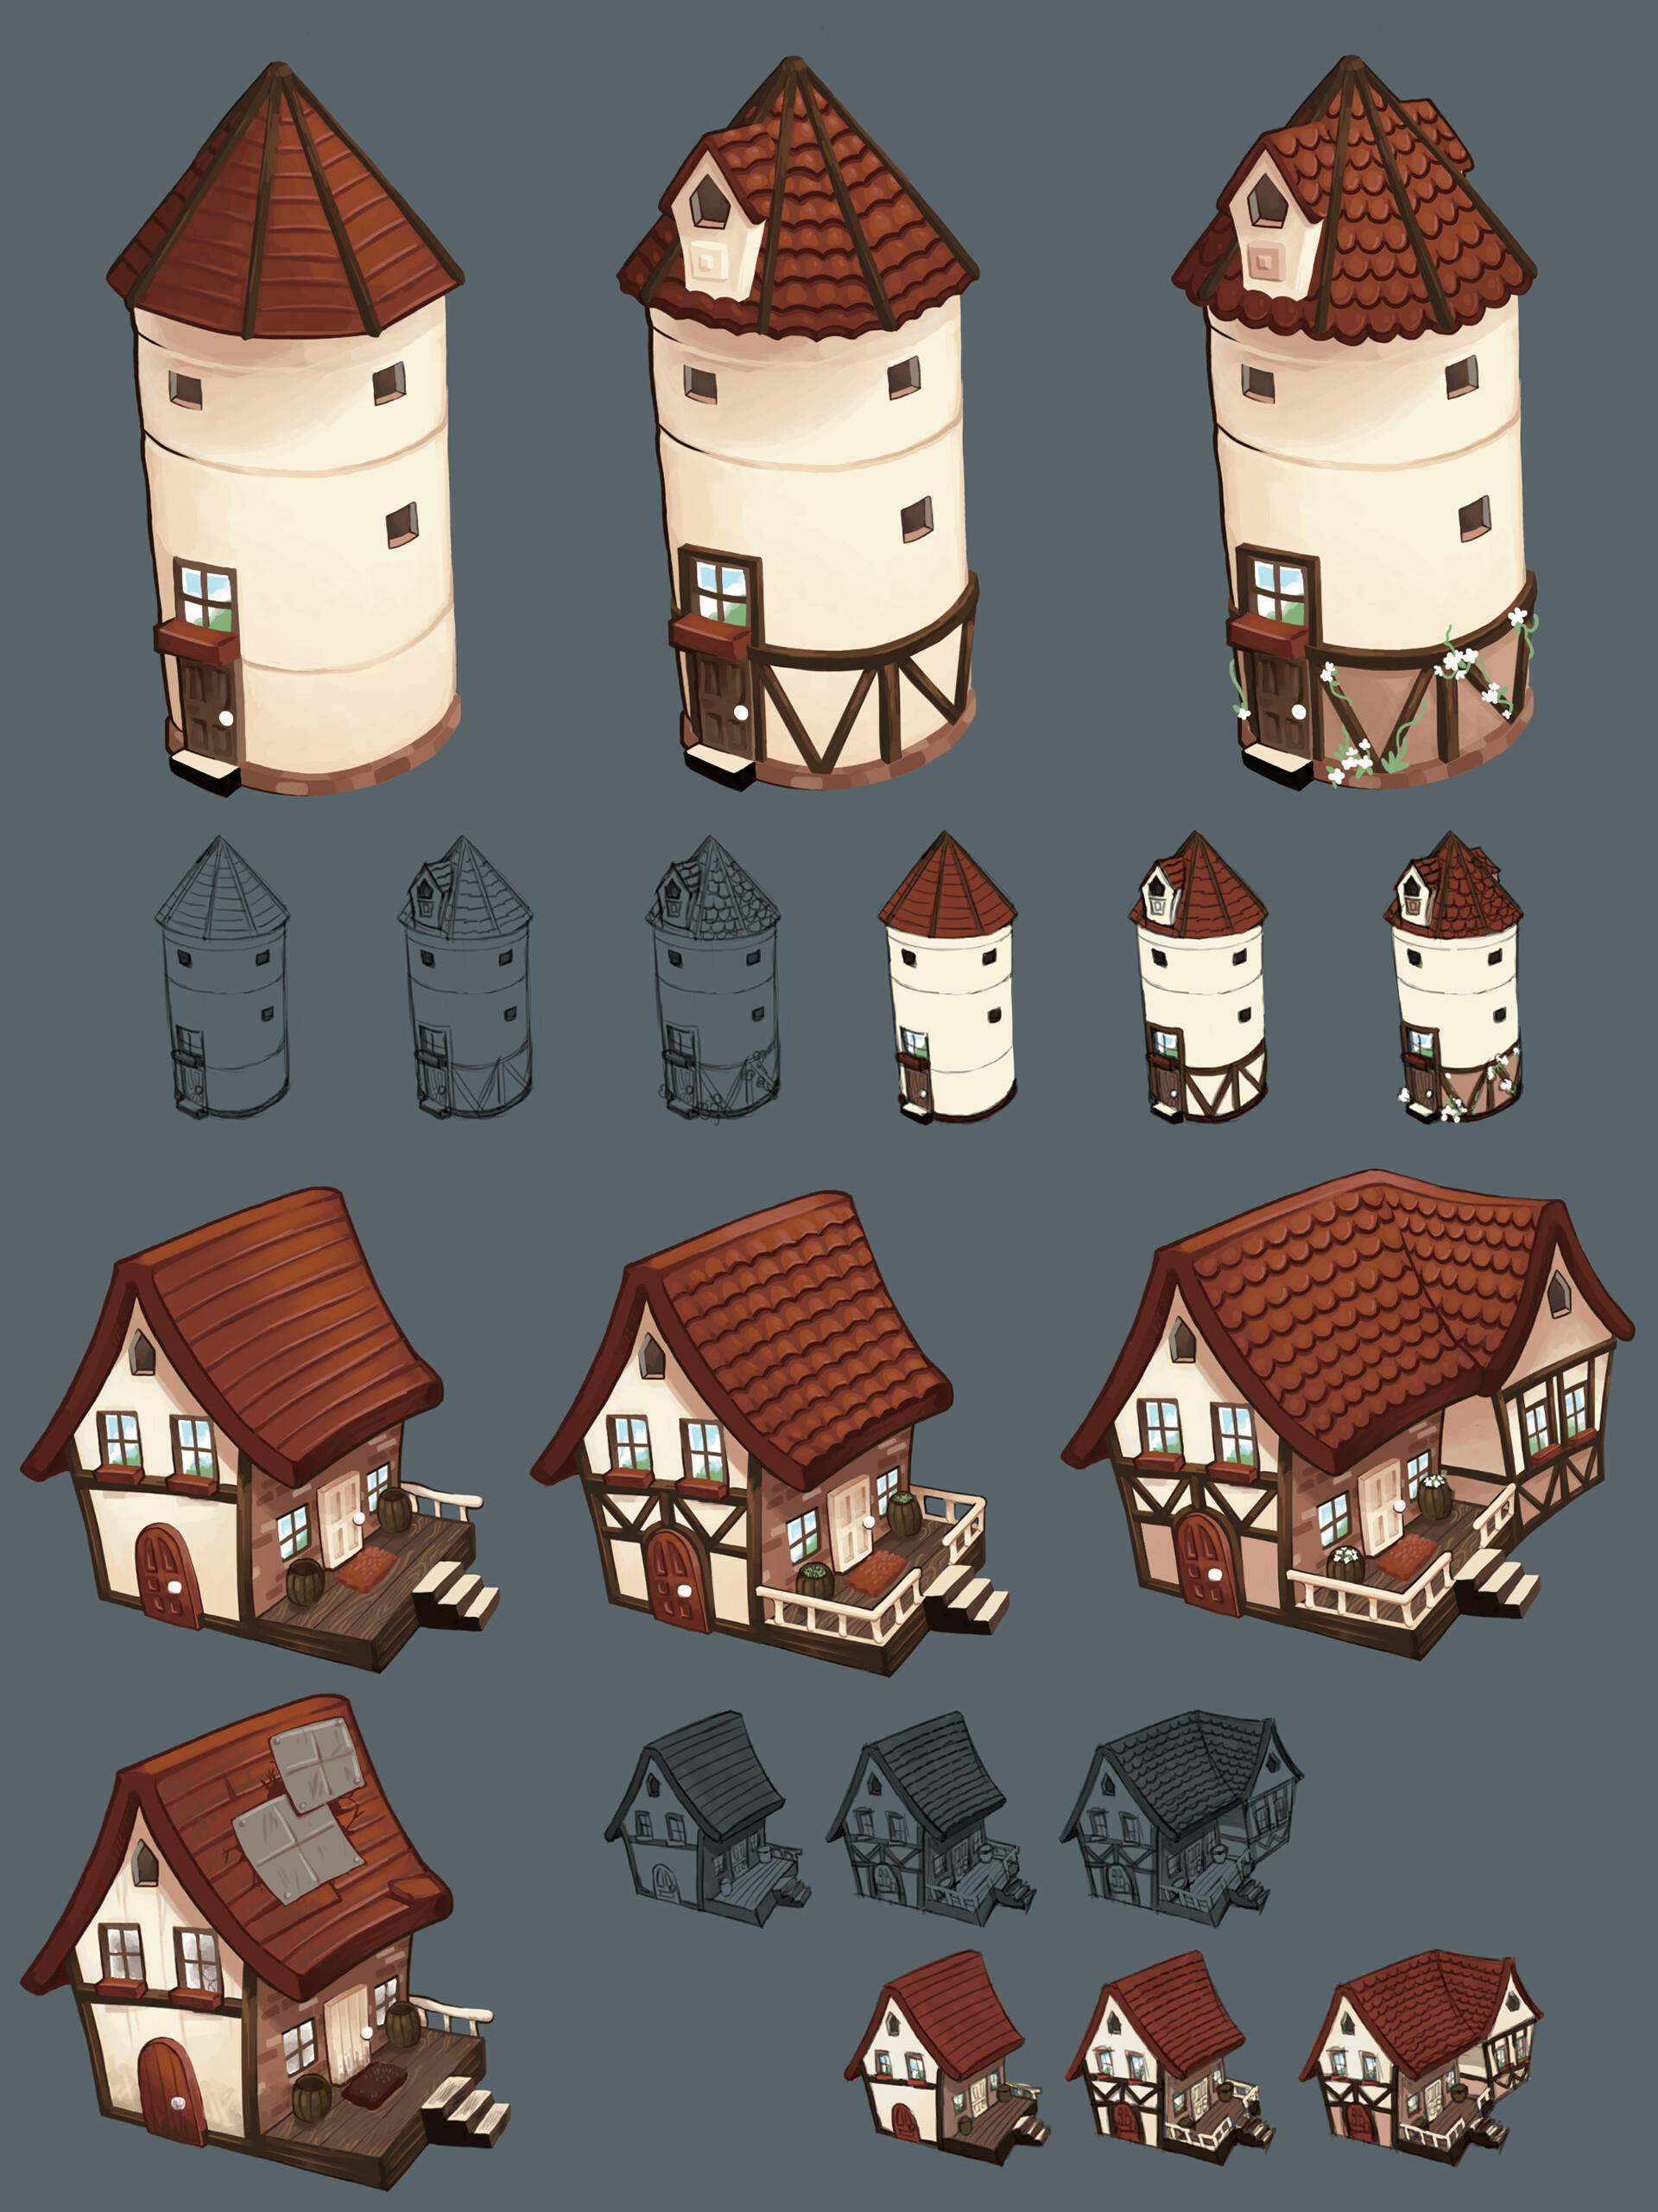 Farmer's silo and house + upgrades